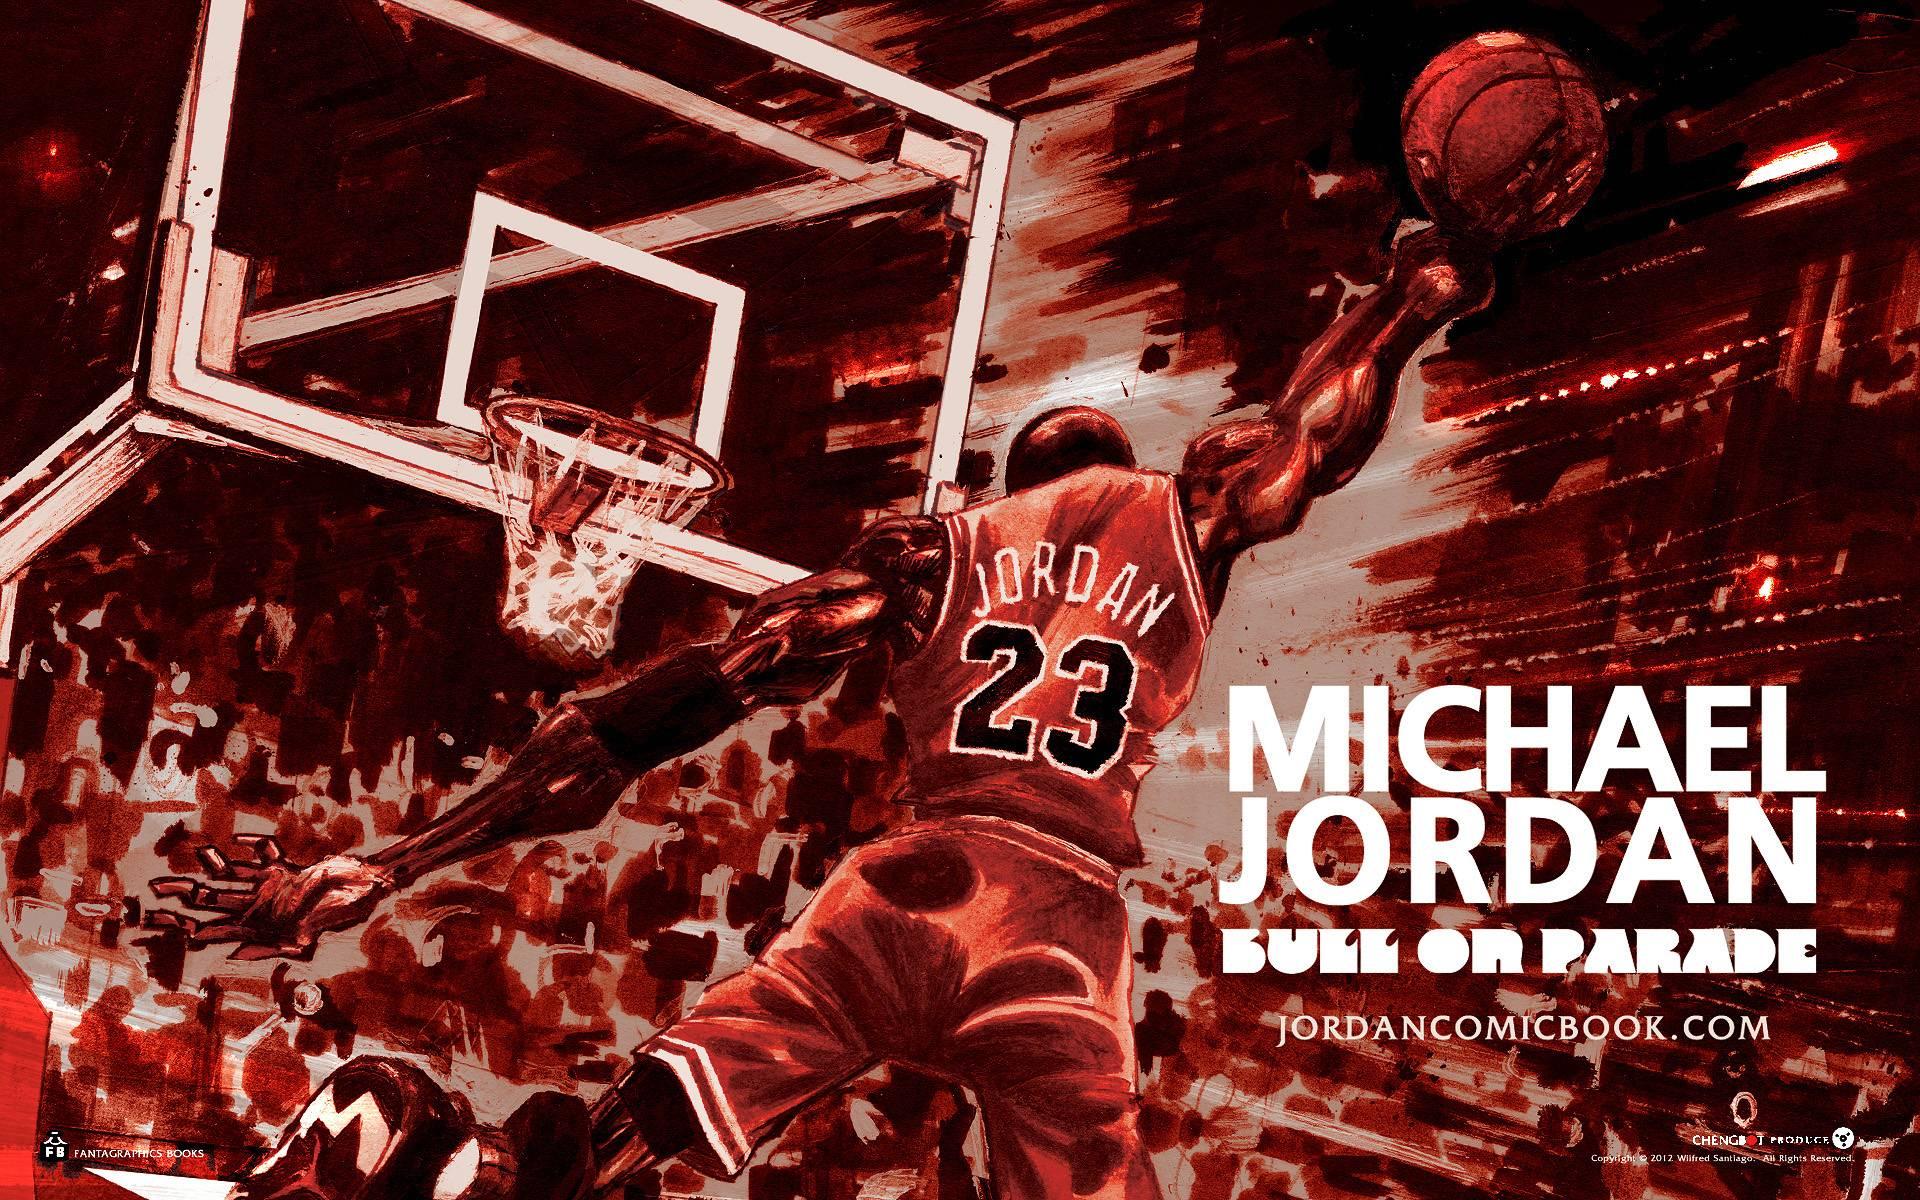 Jordan Logo Wallpaper Michael Jordan Cool Backgrounds 1920x1200 Wallpaper Teahub Io